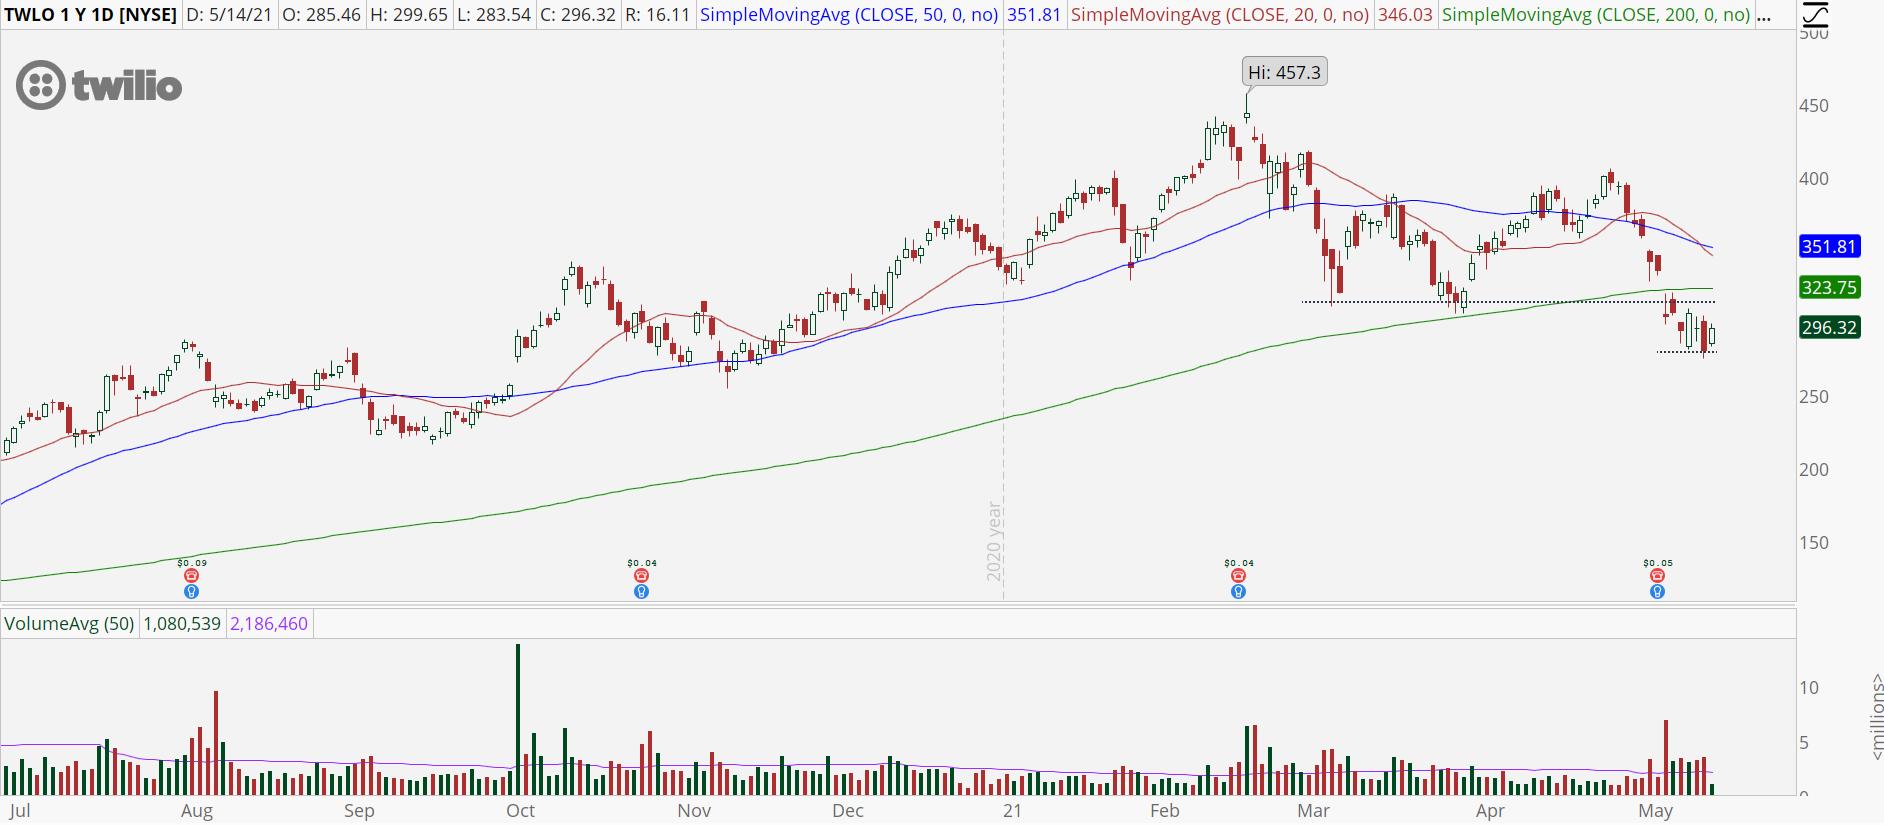 Twilio (TWLO) stock with a low base pattern